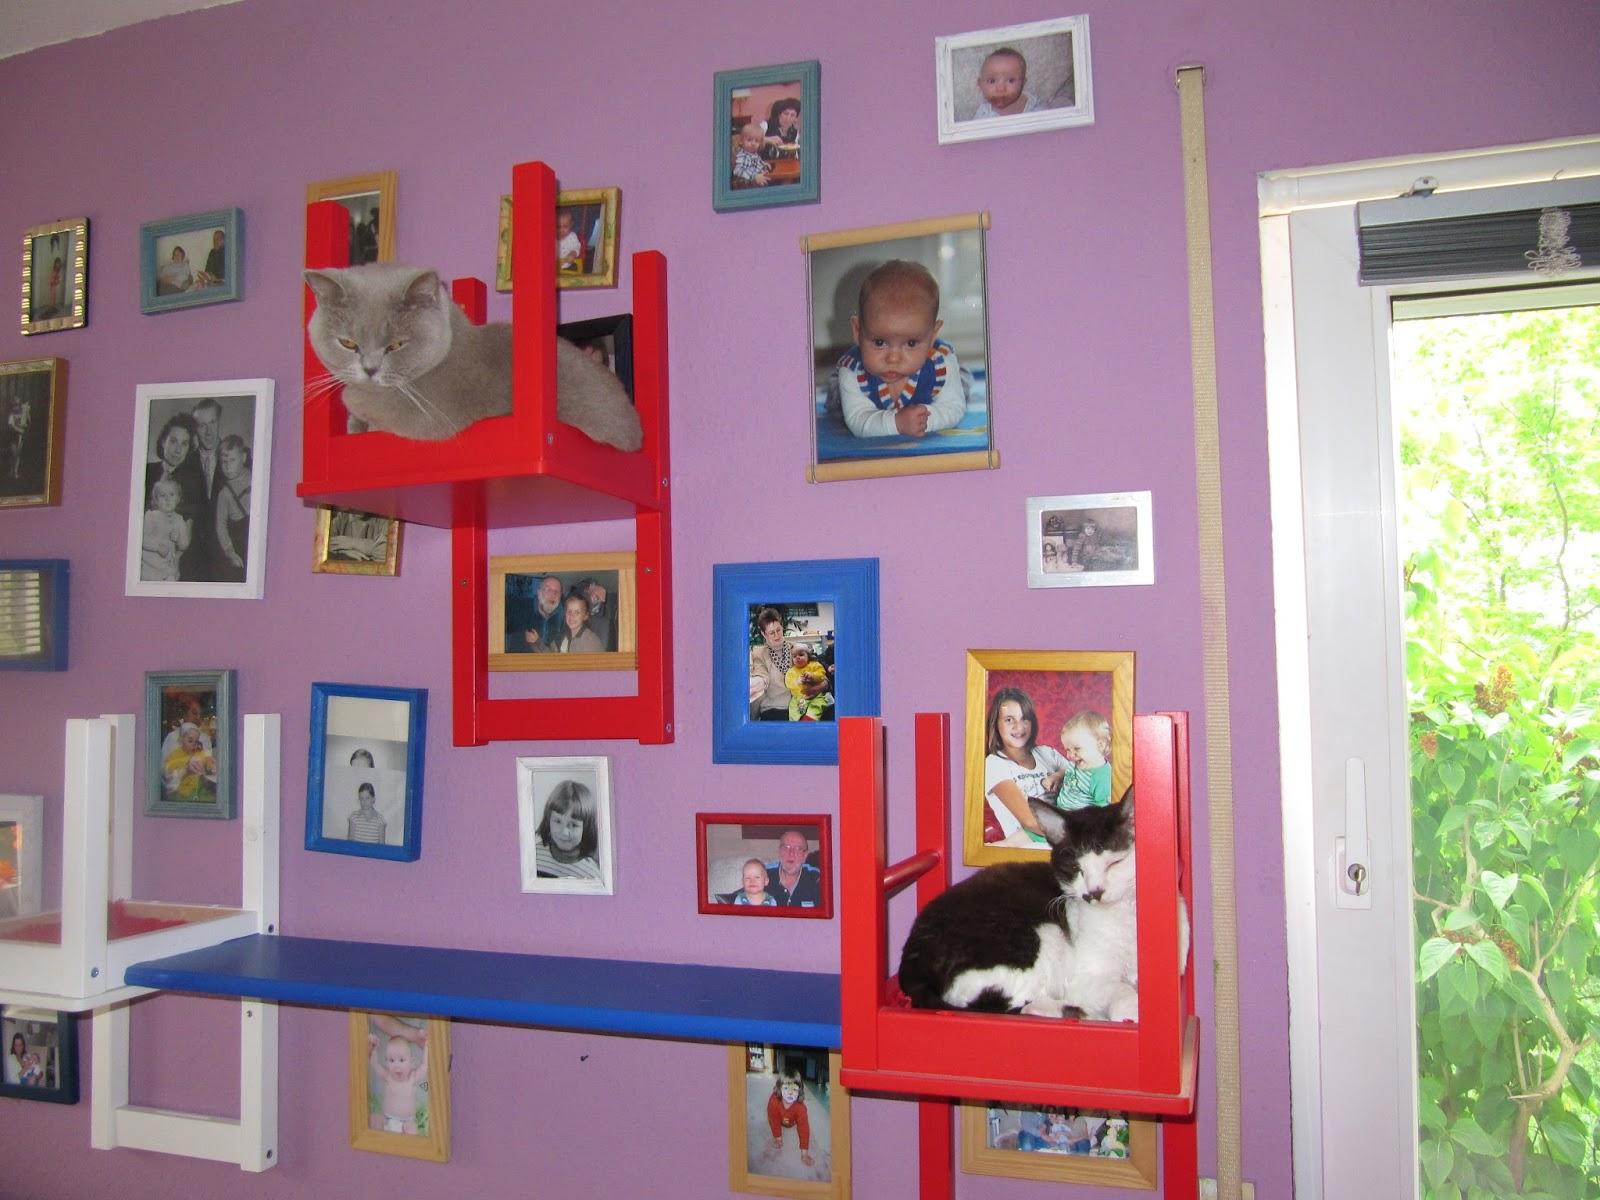 basteln katzen kletterwand einmal anders. Black Bedroom Furniture Sets. Home Design Ideas